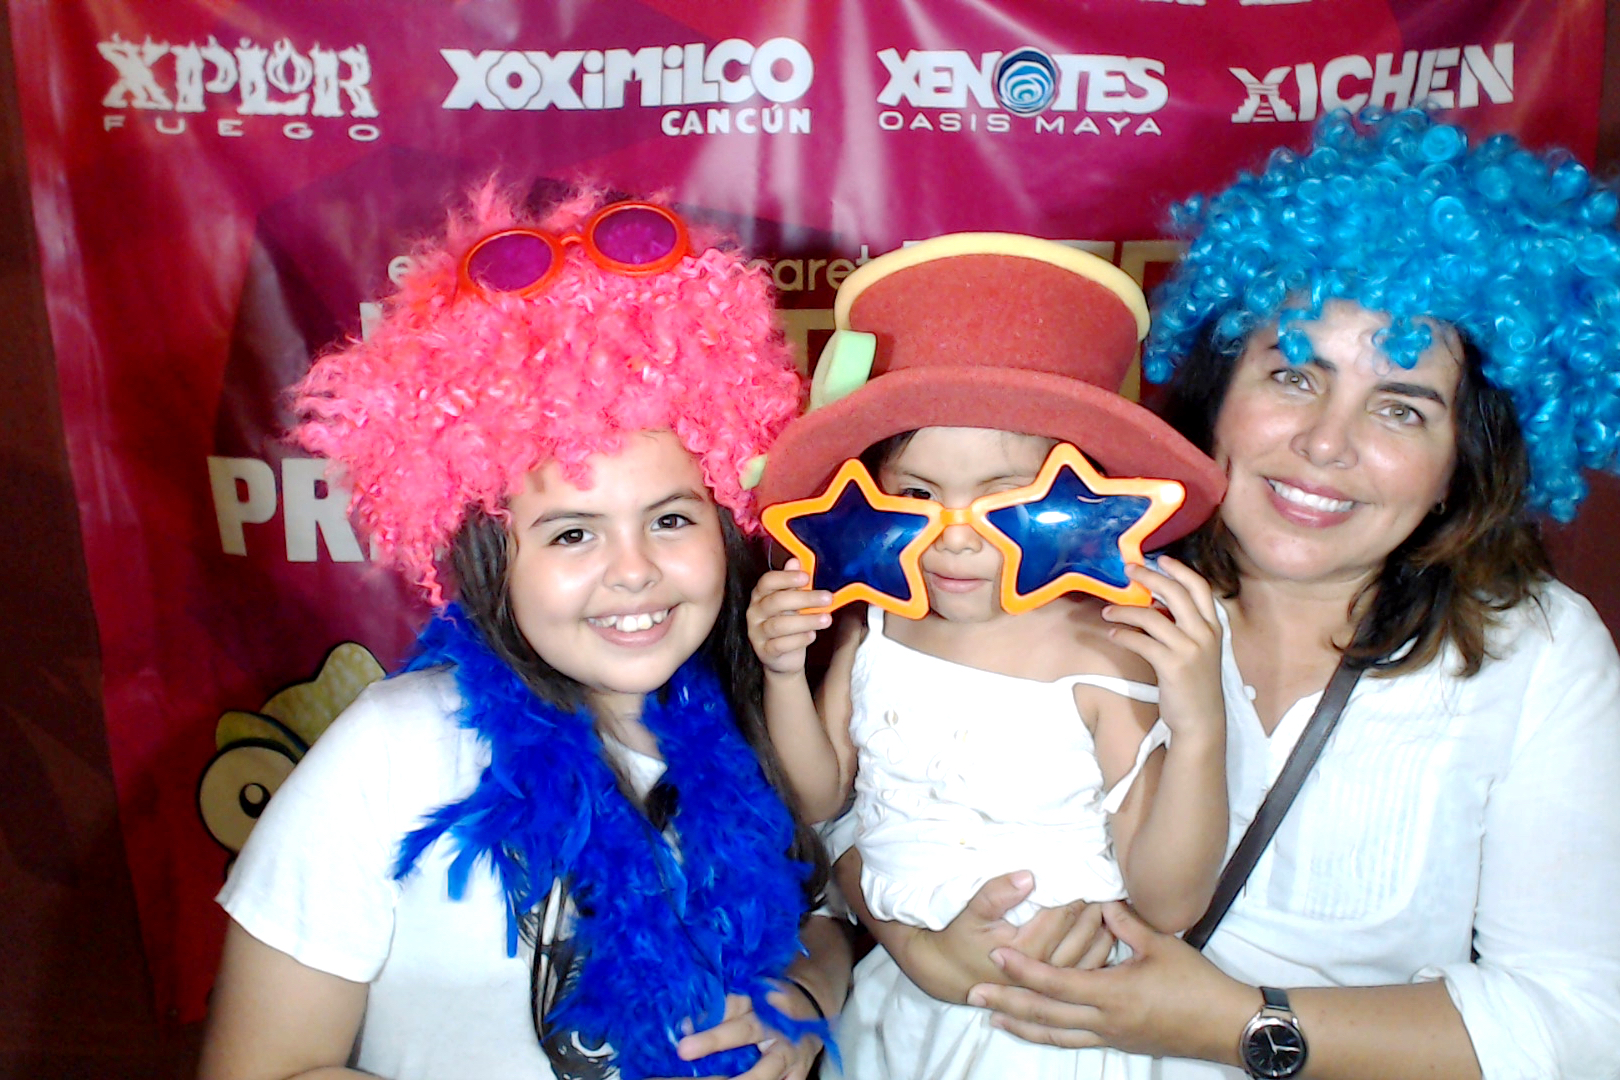 PhotoBoothRivieraMayaMexico0037.JPG